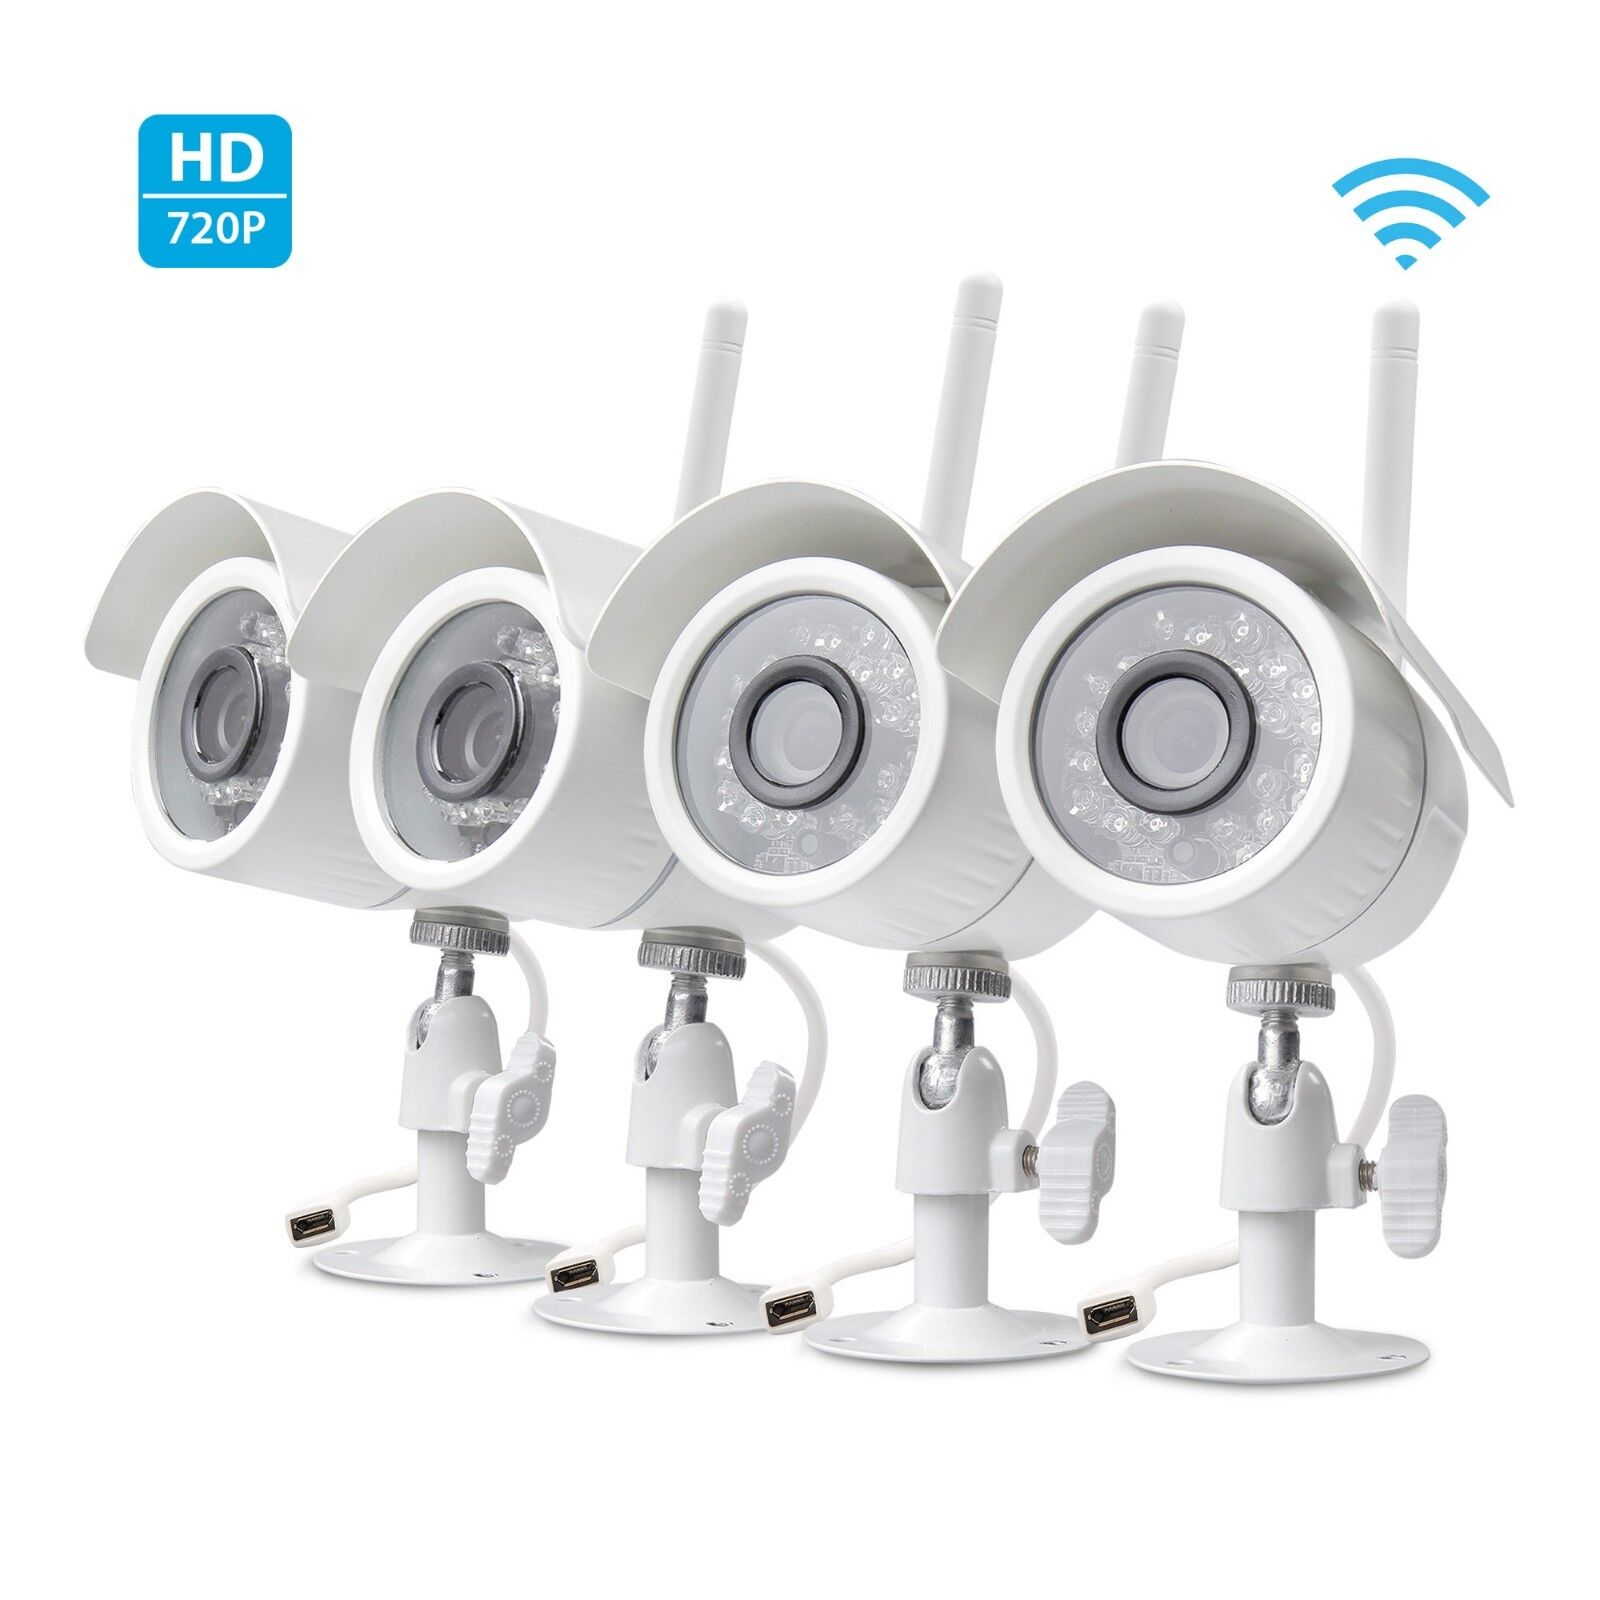 Купить Zmodo 720p HD 4 IP Wireless Outdoor IR Night Vision Home Security Camera System